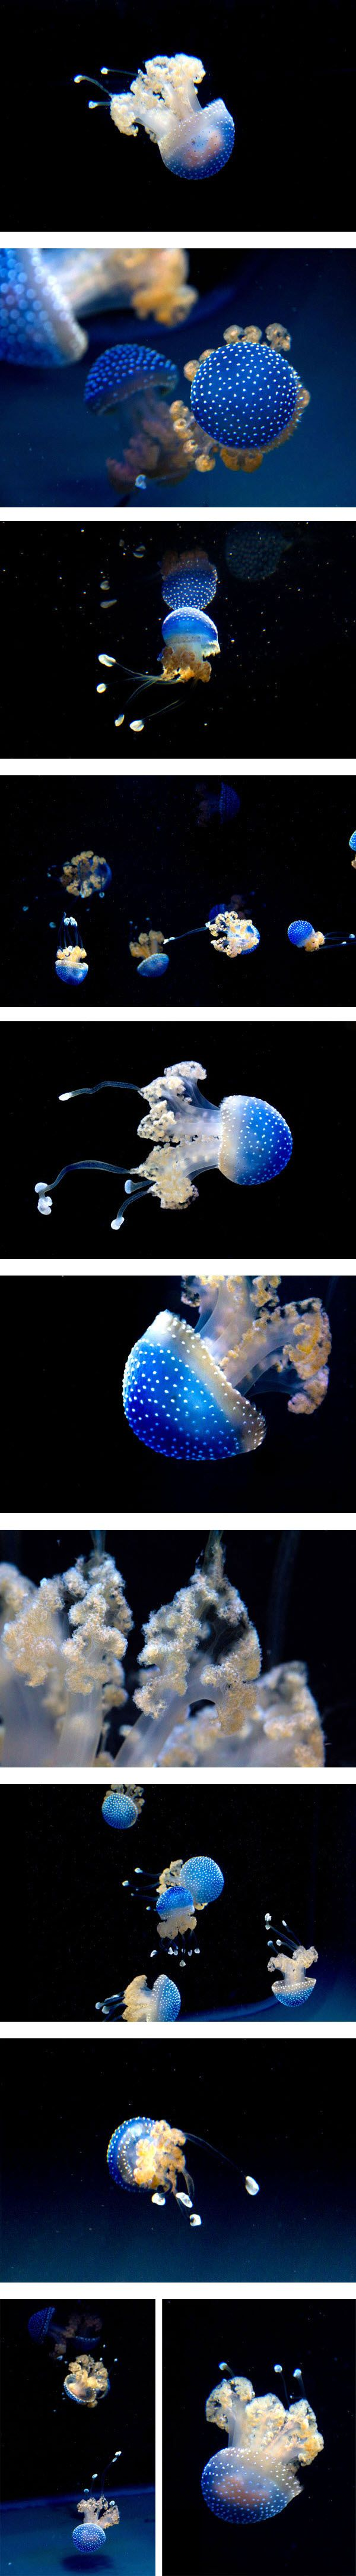 The Australian #jellyfish